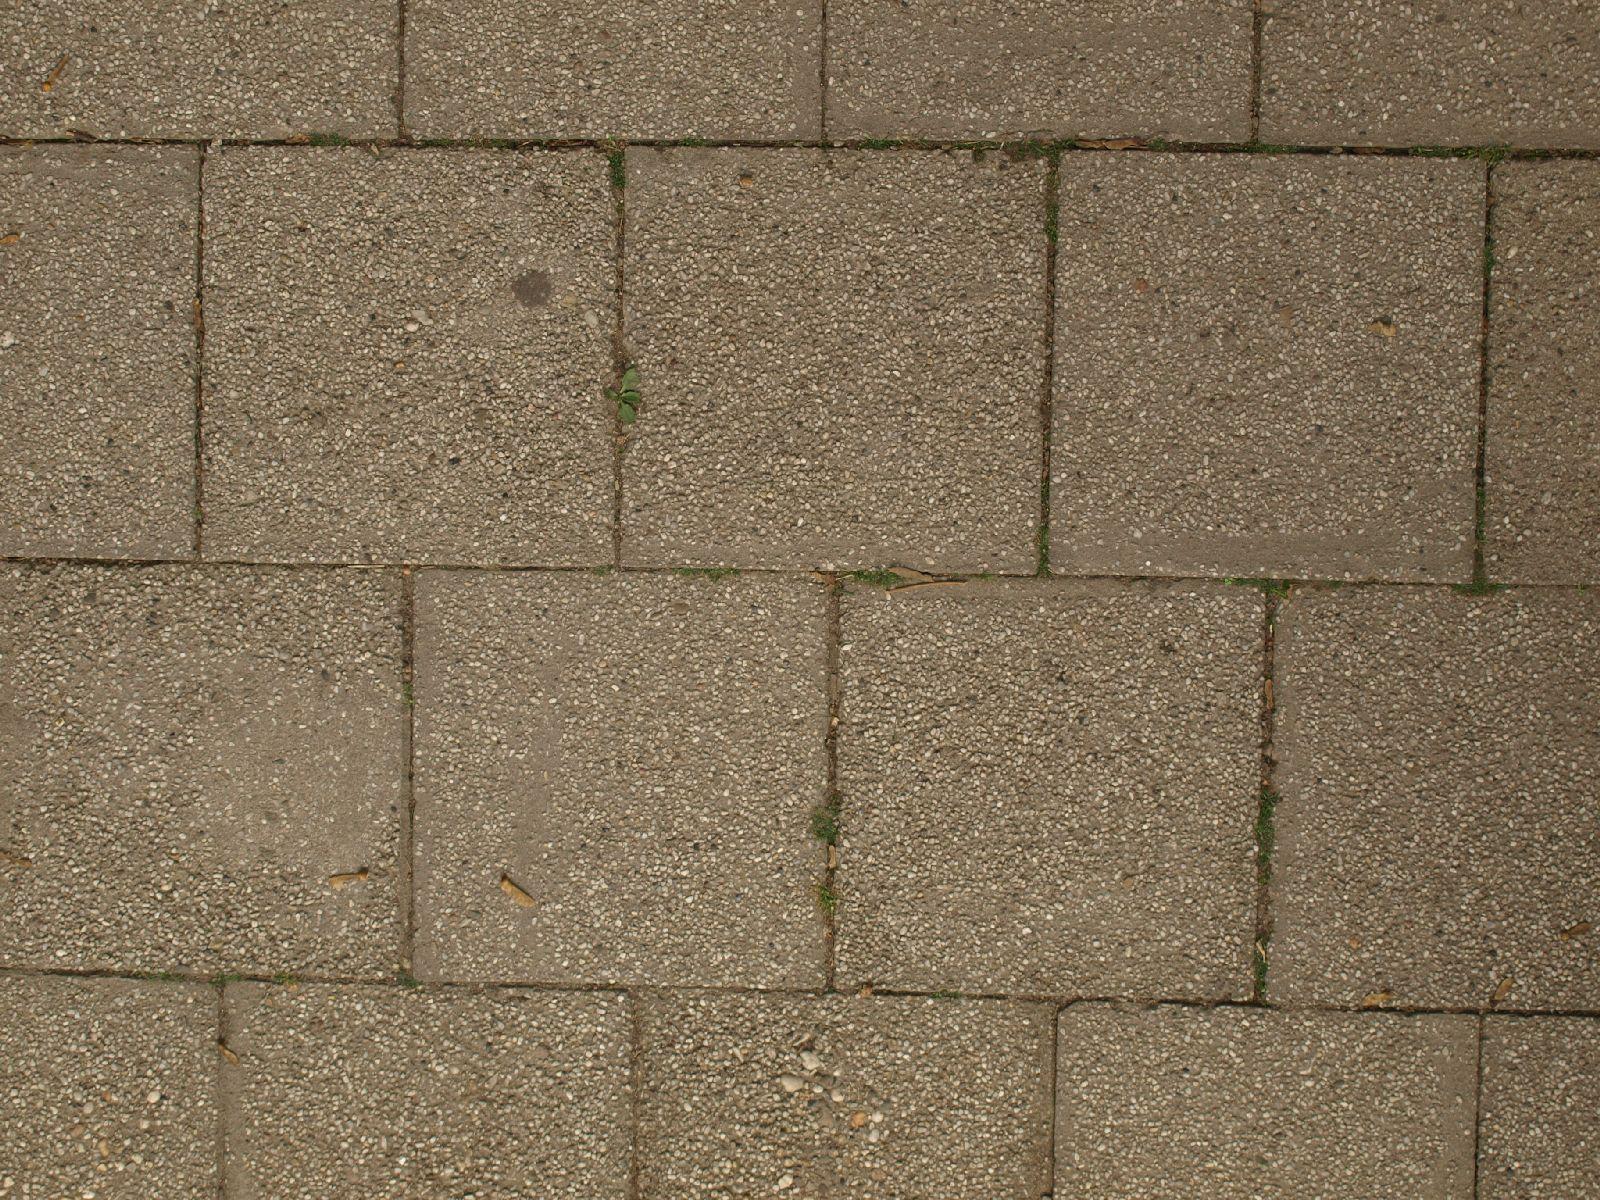 Ground-Urban_Texture_A_PA039932